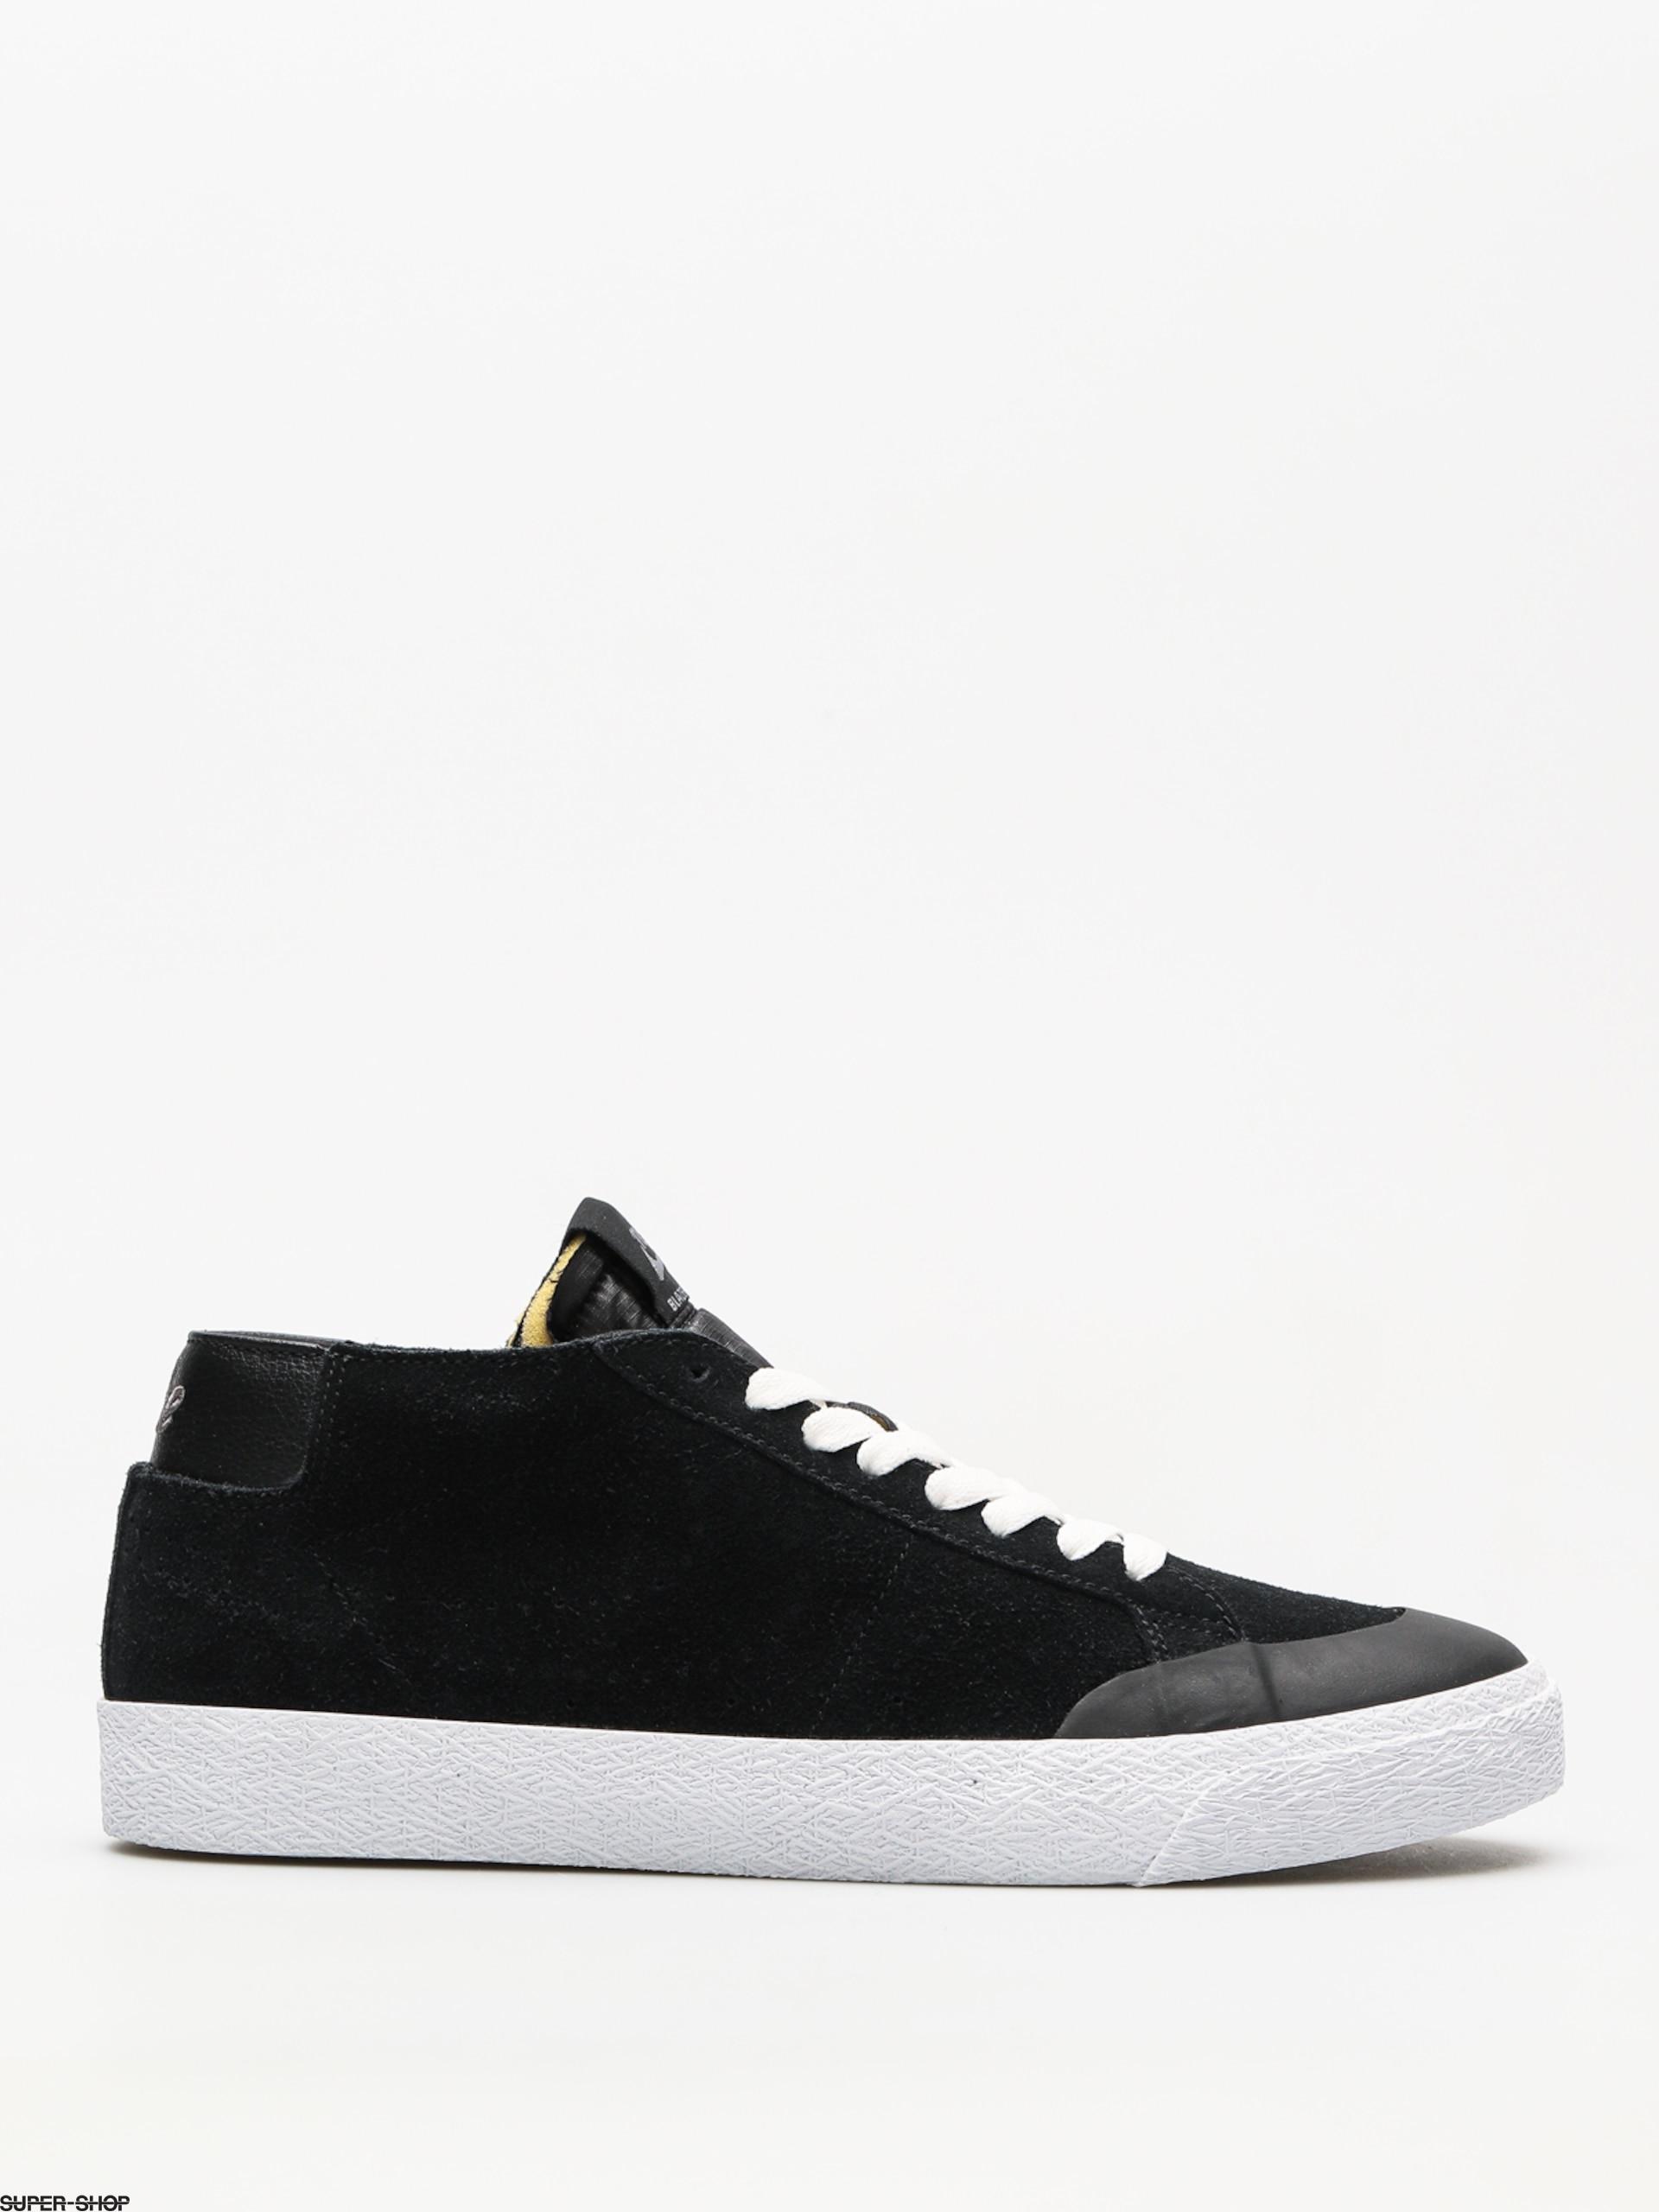 new styles 18d72 d0d6c Nike SB Schuhe Sb Zoom Blazer Chukka Xt (black/black gunsmoke)